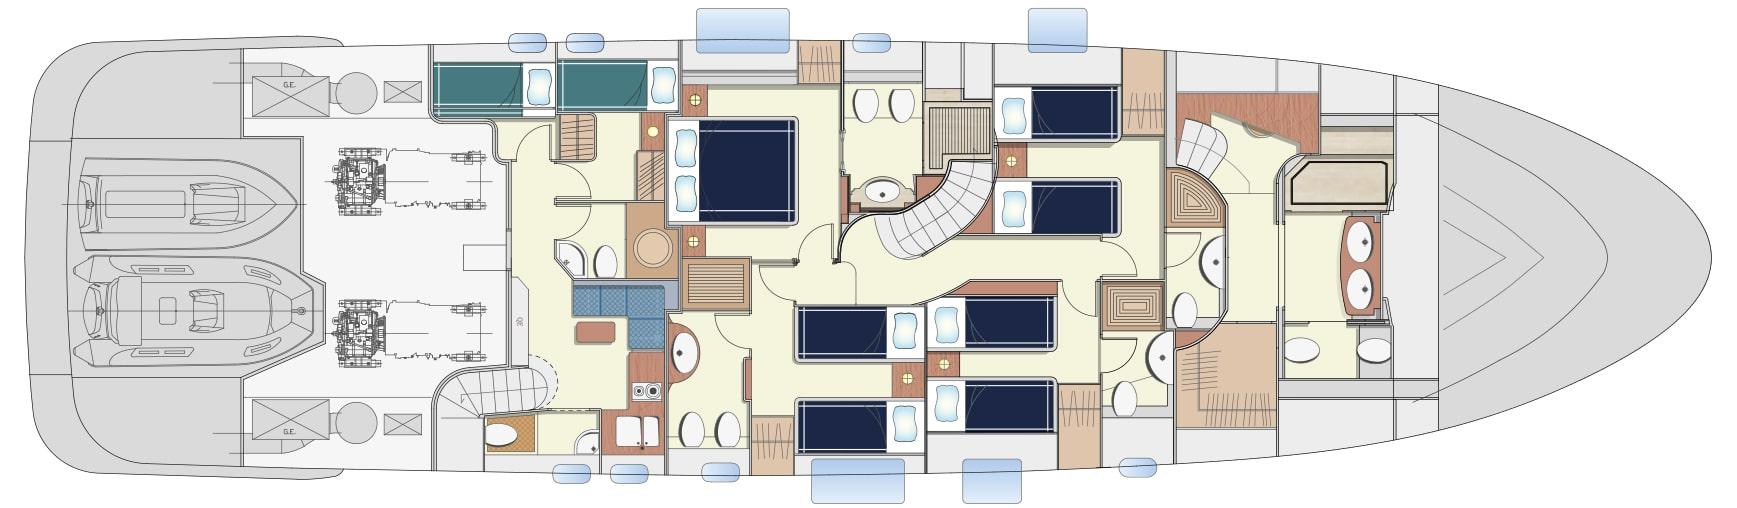 Lower deck version B 4 cabins